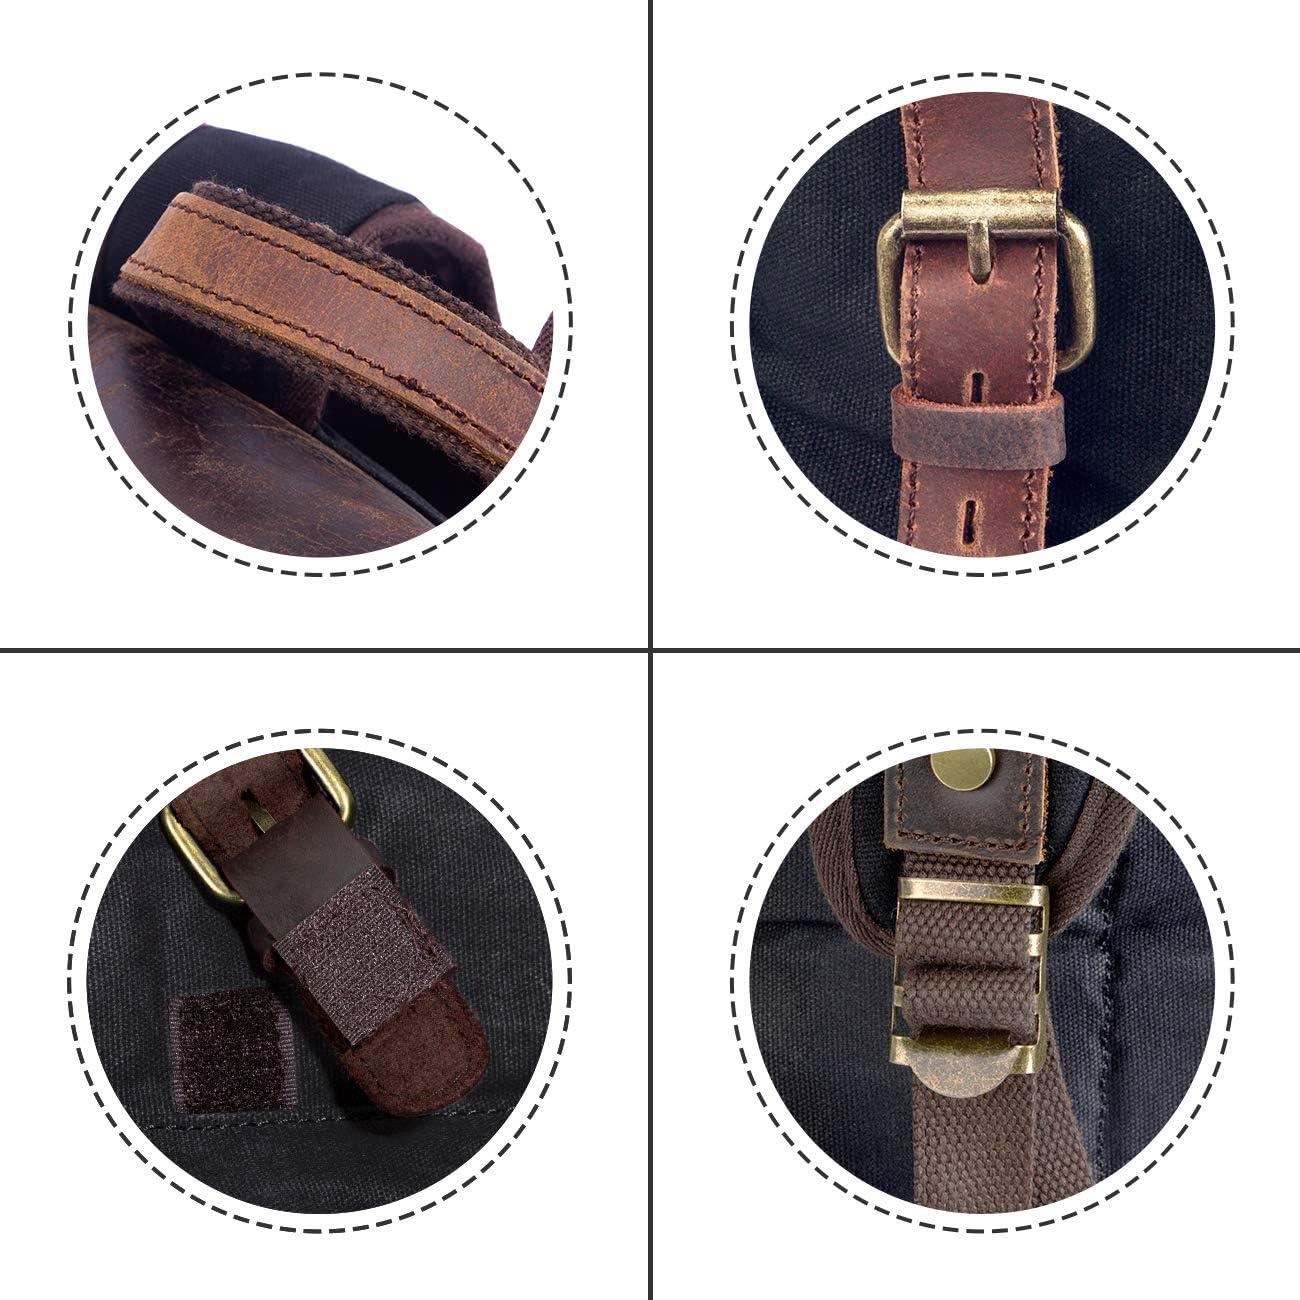 Mochila de Lona Vintage de Piel Genuina Mochila Casual Impermeable Bolsa de Escuela para Portatil de 15.6 Pulgadas Bolsa de Viaje Negro